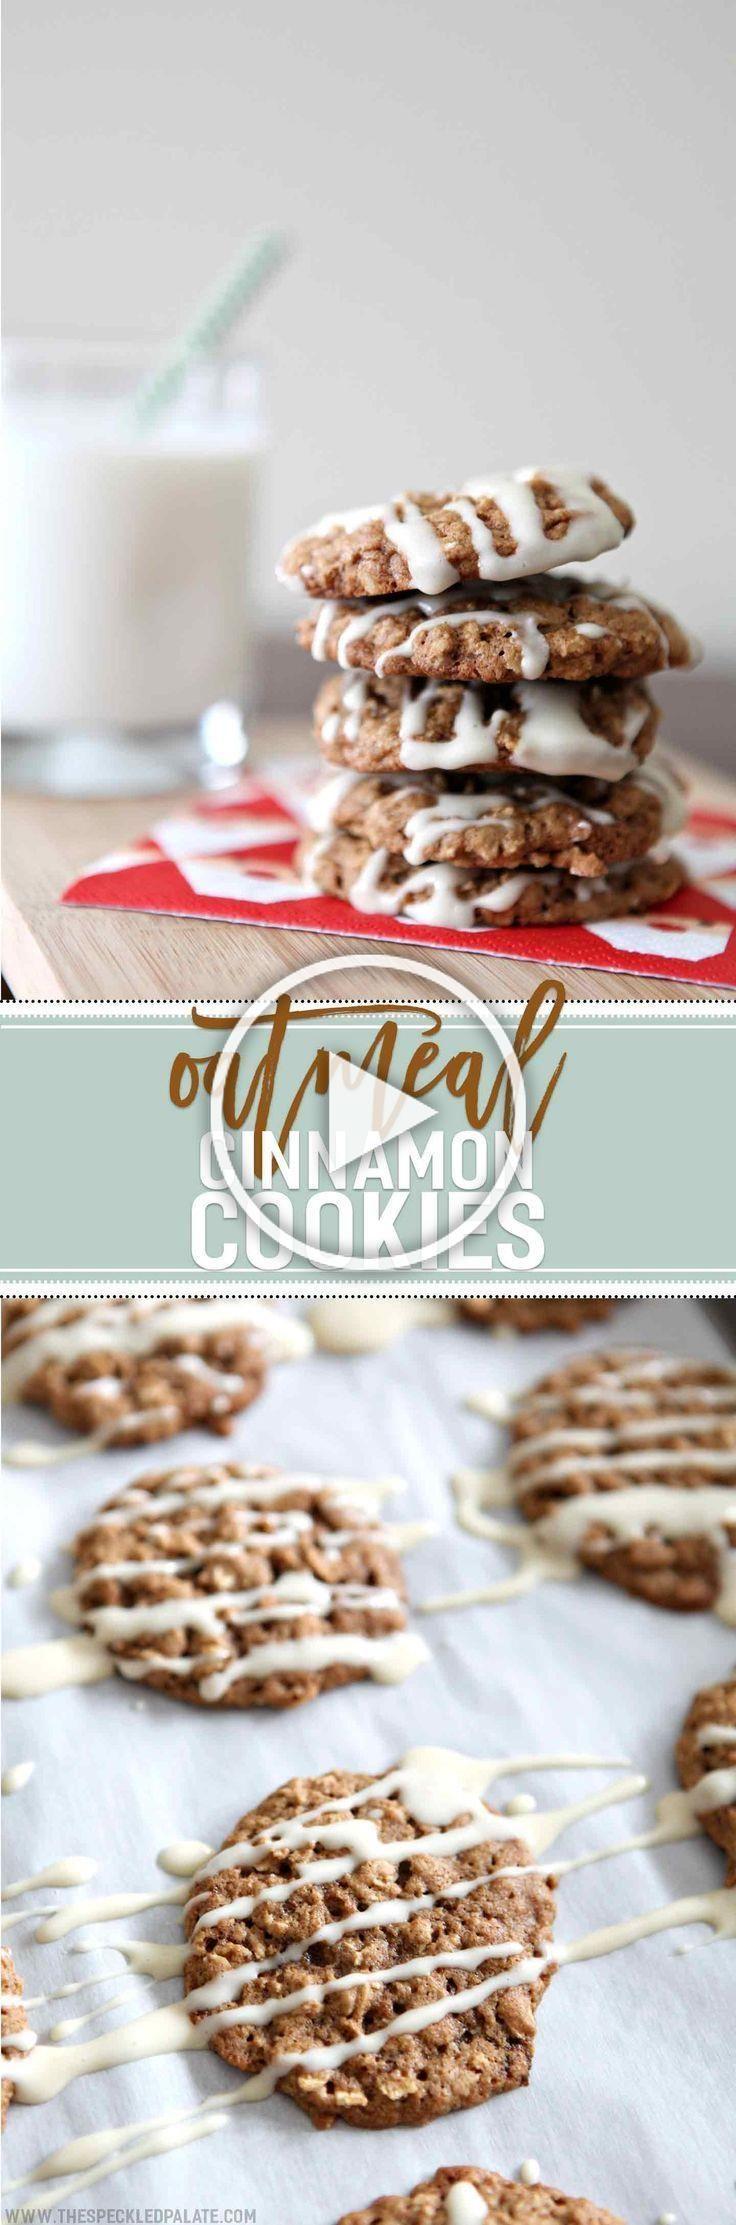 43++ Truestone craft bakery cinnamon oat information